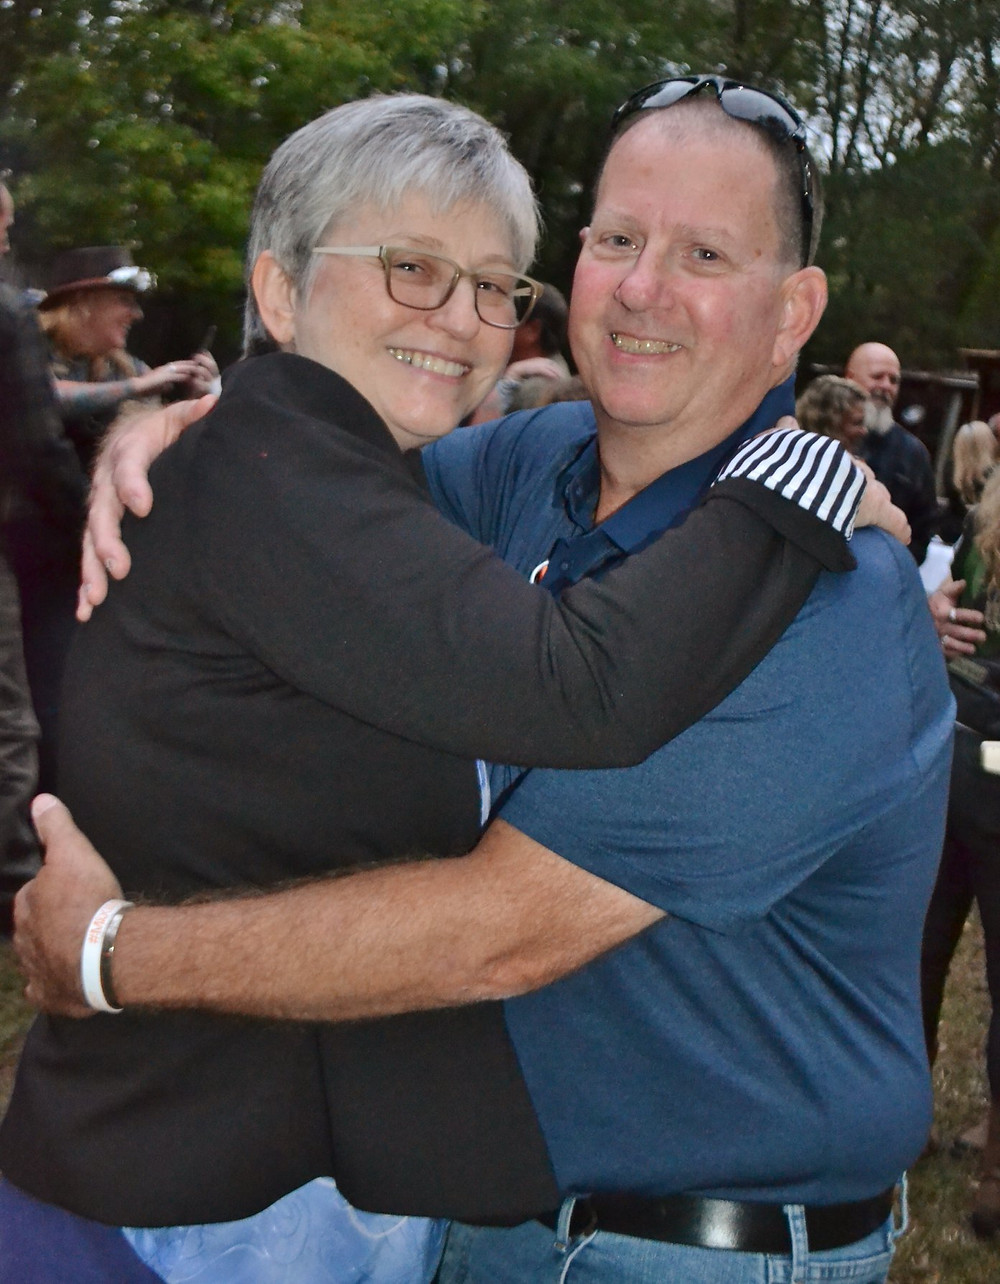 Operation We Care Founders Diana & Jeff Merritt